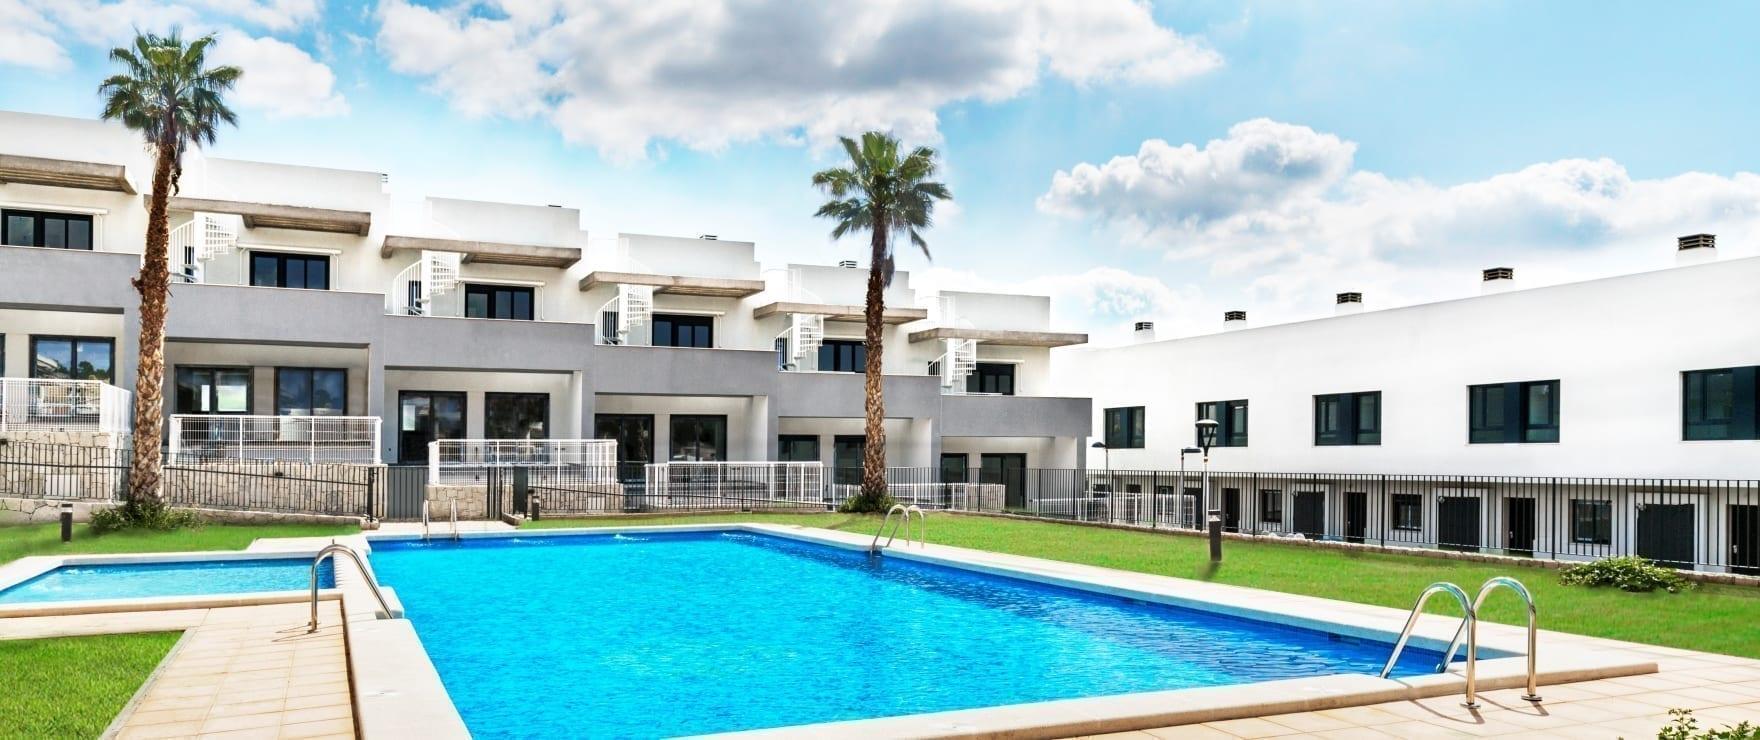 Kiruna Residencial - Elche  (Alicante)